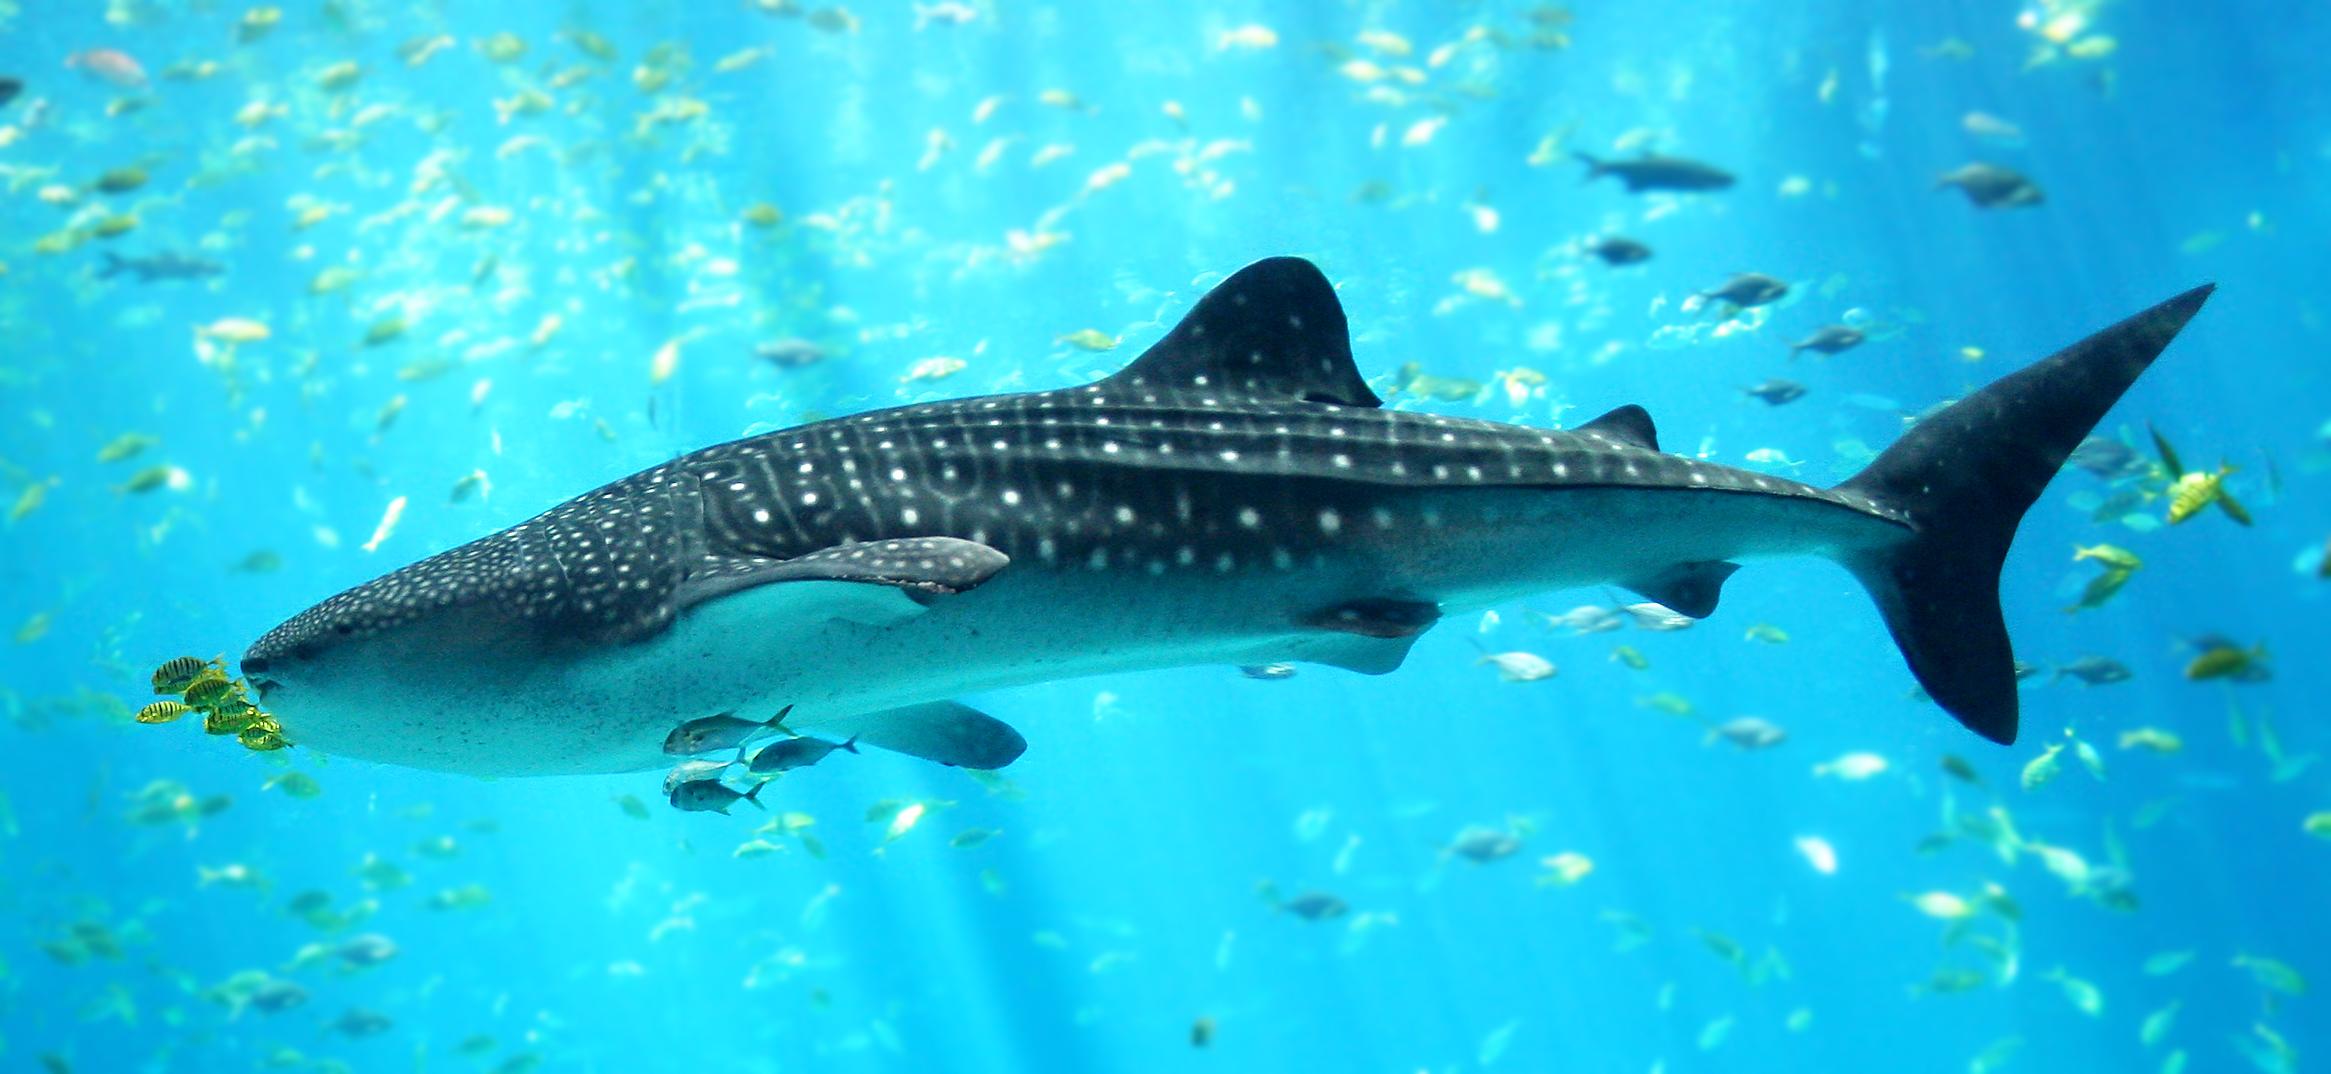 Poisson - Poisson shark aquarium ...